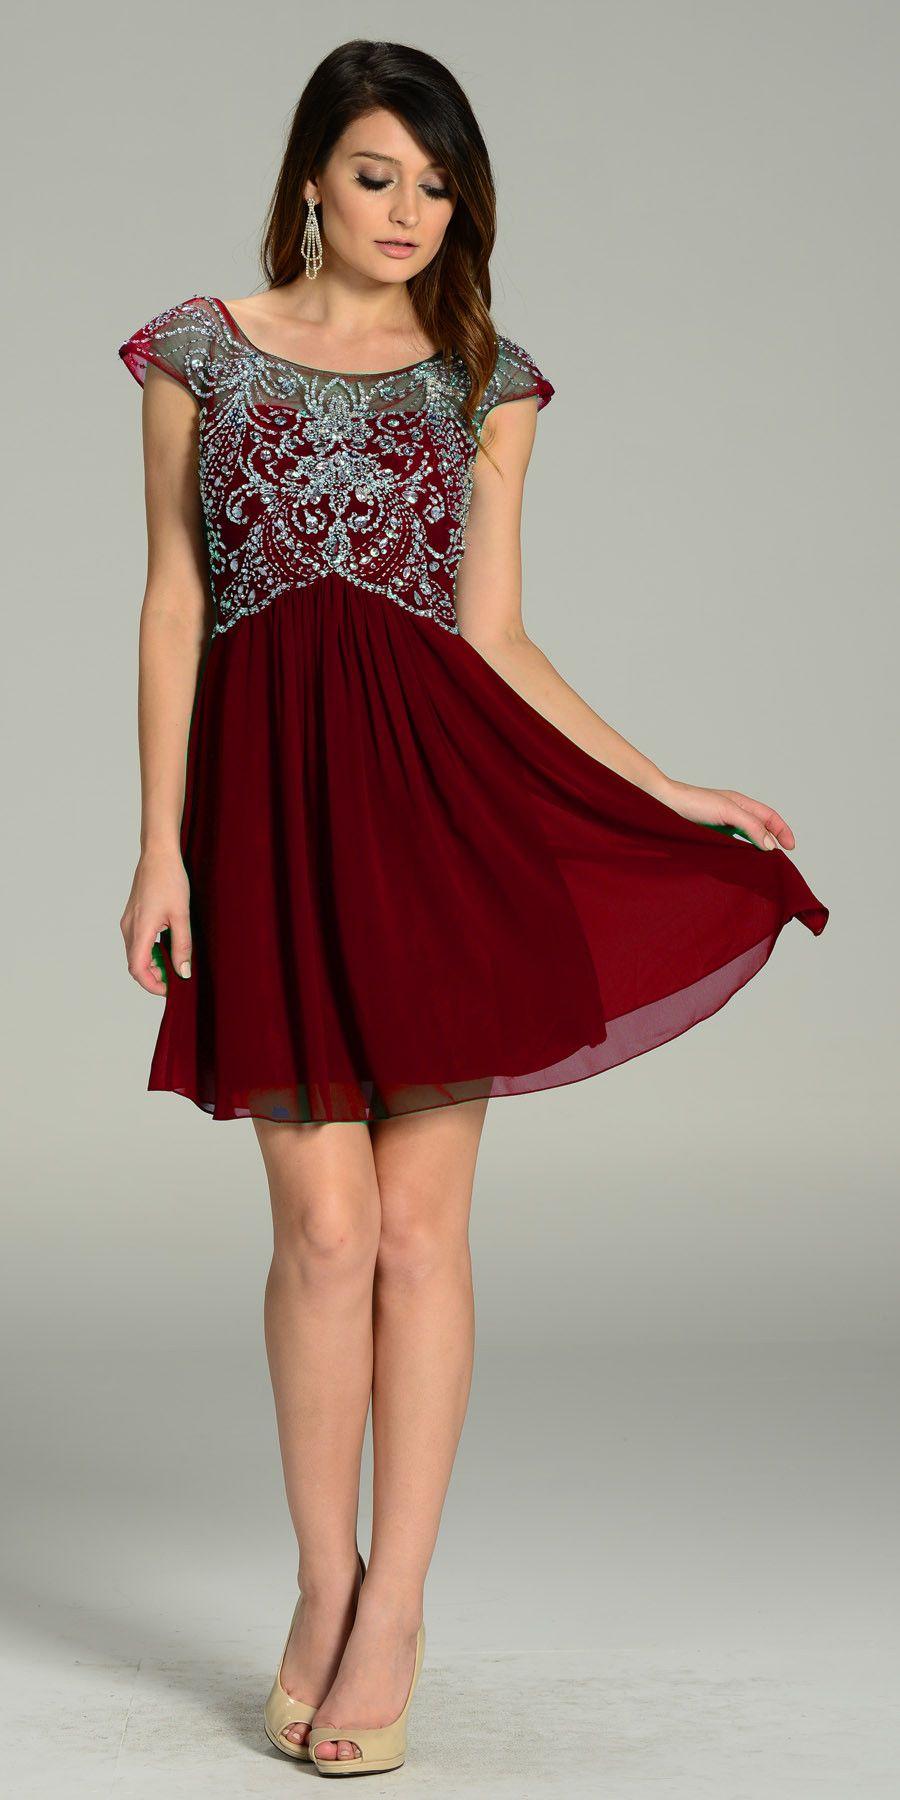 Short Chiffon/Mesh Cap Sleeve Dress Blush Empire Waist